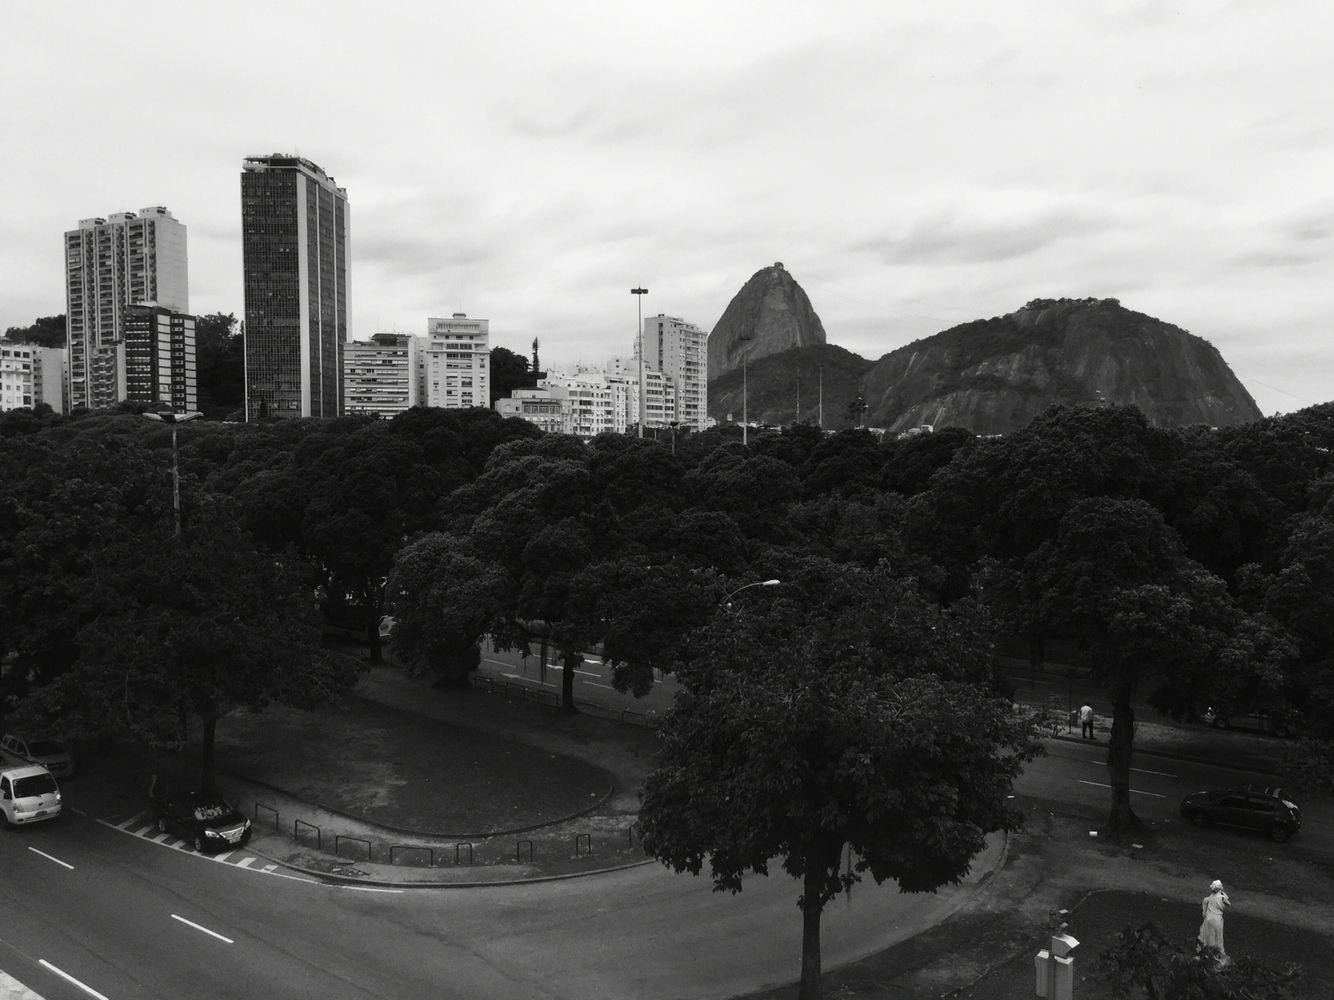 Dionel Orona - Rio de Janeiro - Tattoo studio